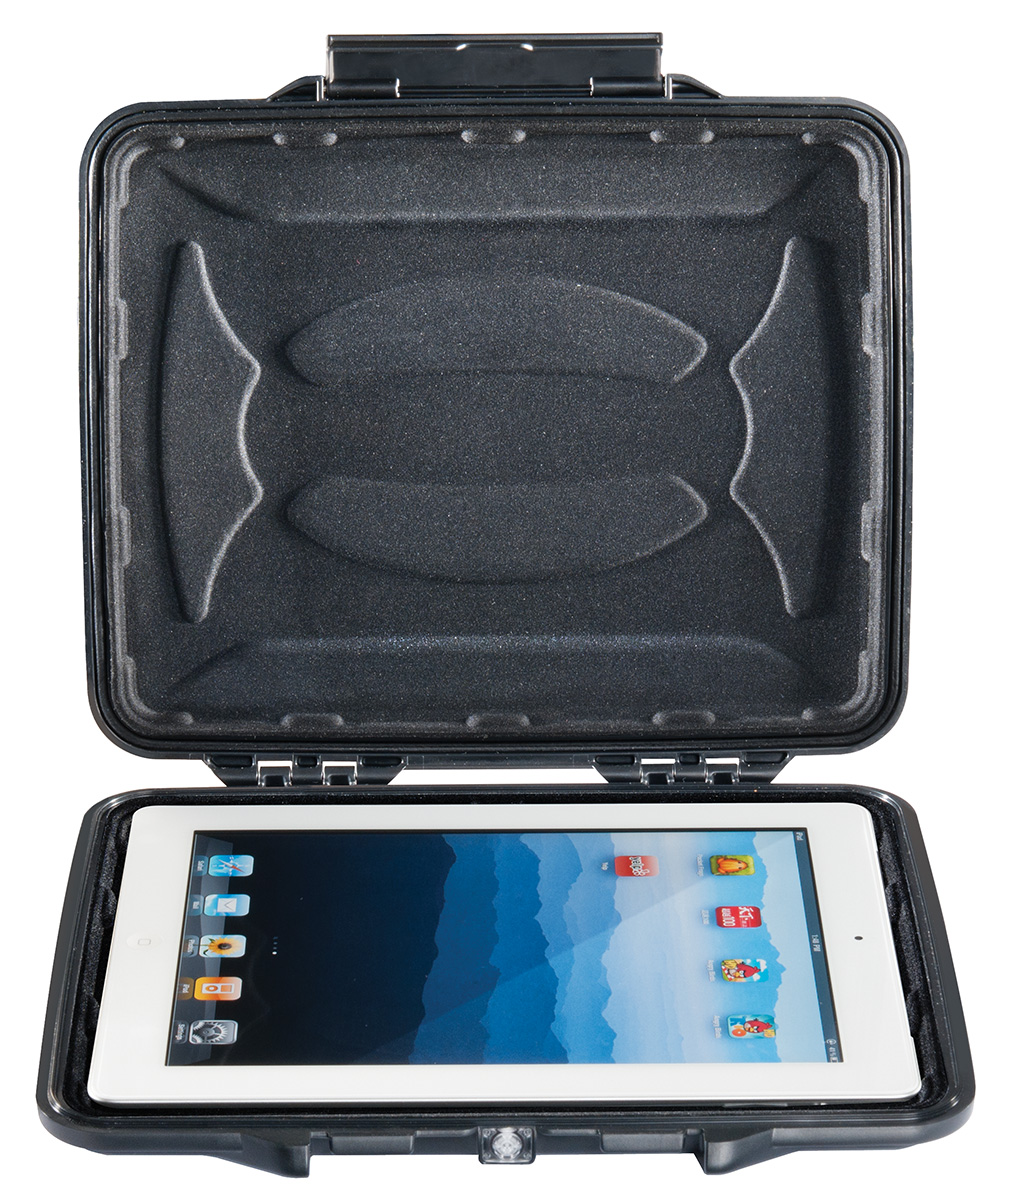 pelican hard waterproof ipad tablet case